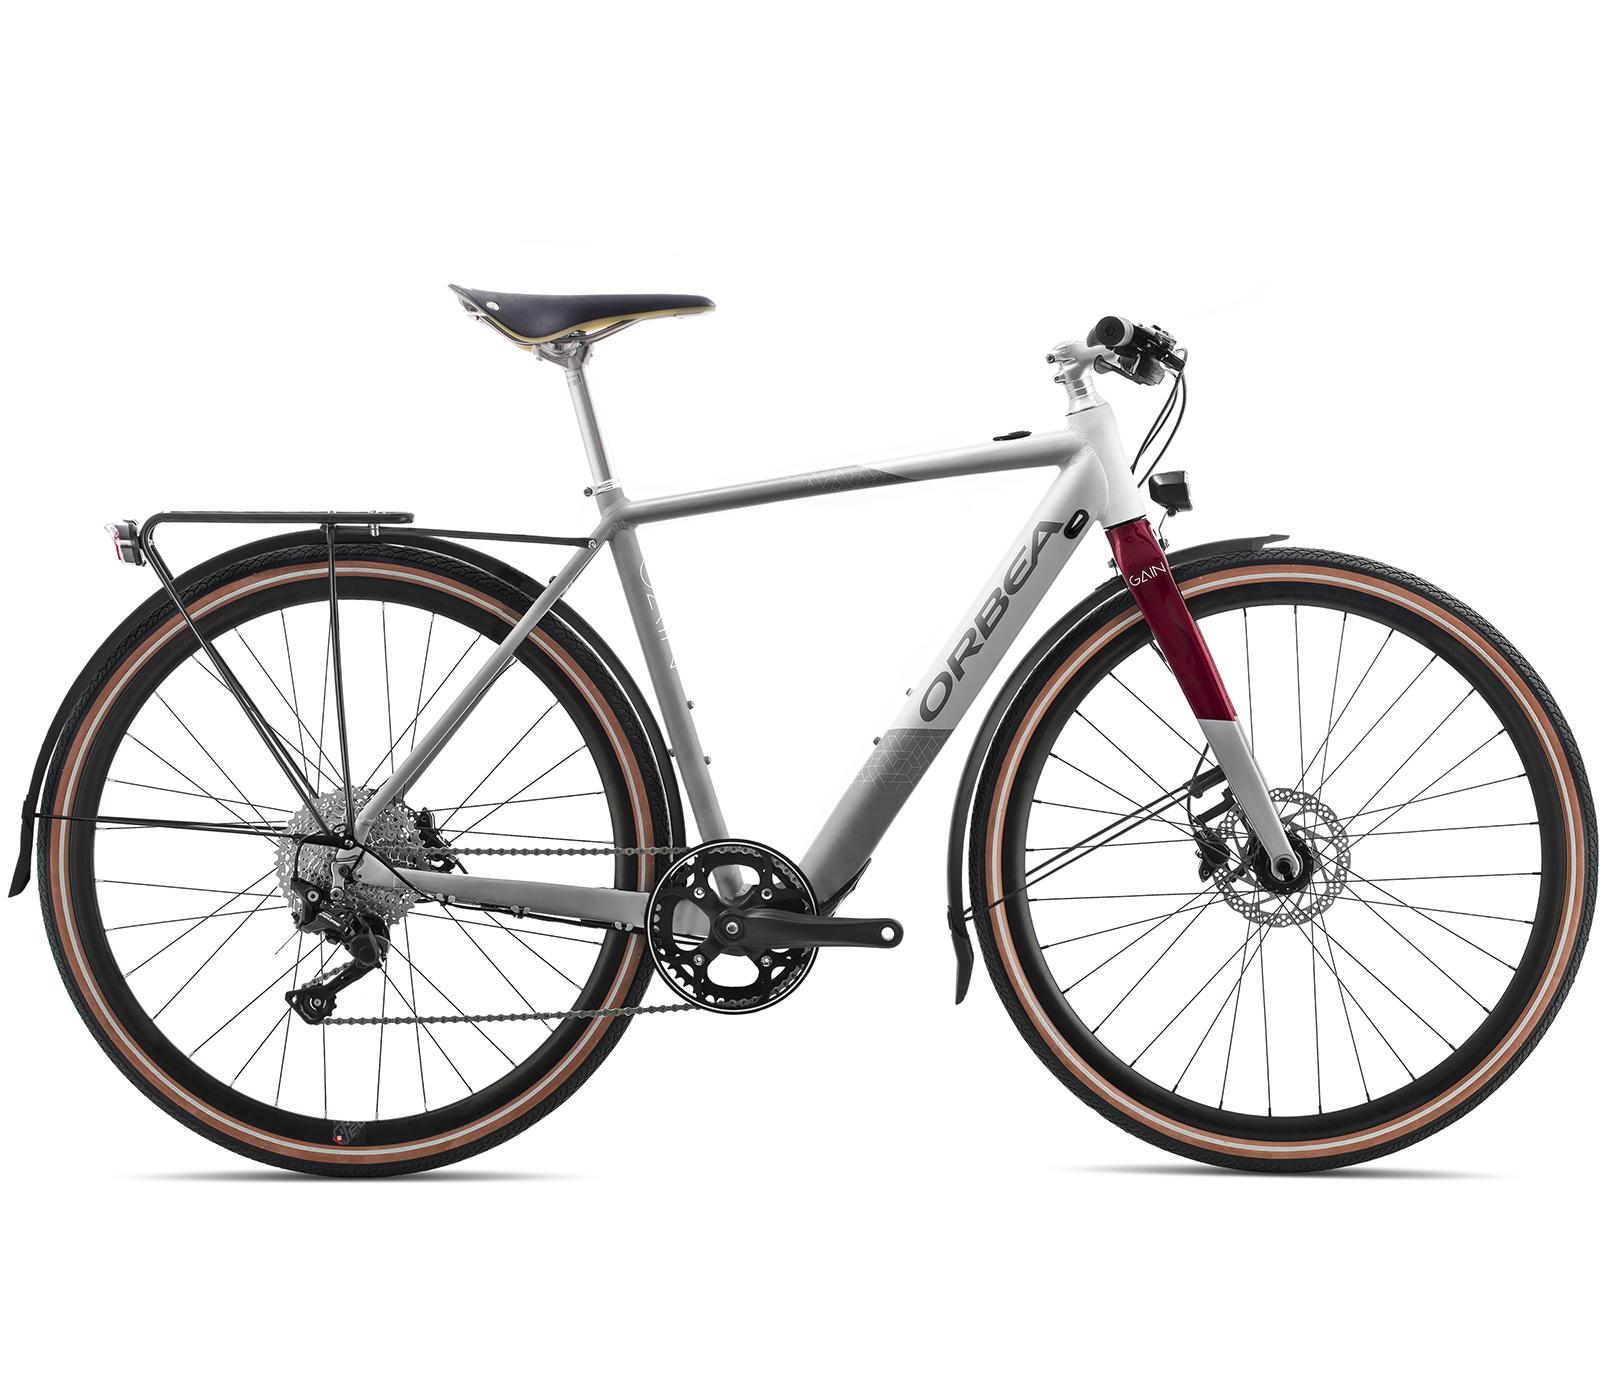 orbea versand orbea e bike gain f10 speedbike grau weiss online kaufen. Black Bedroom Furniture Sets. Home Design Ideas